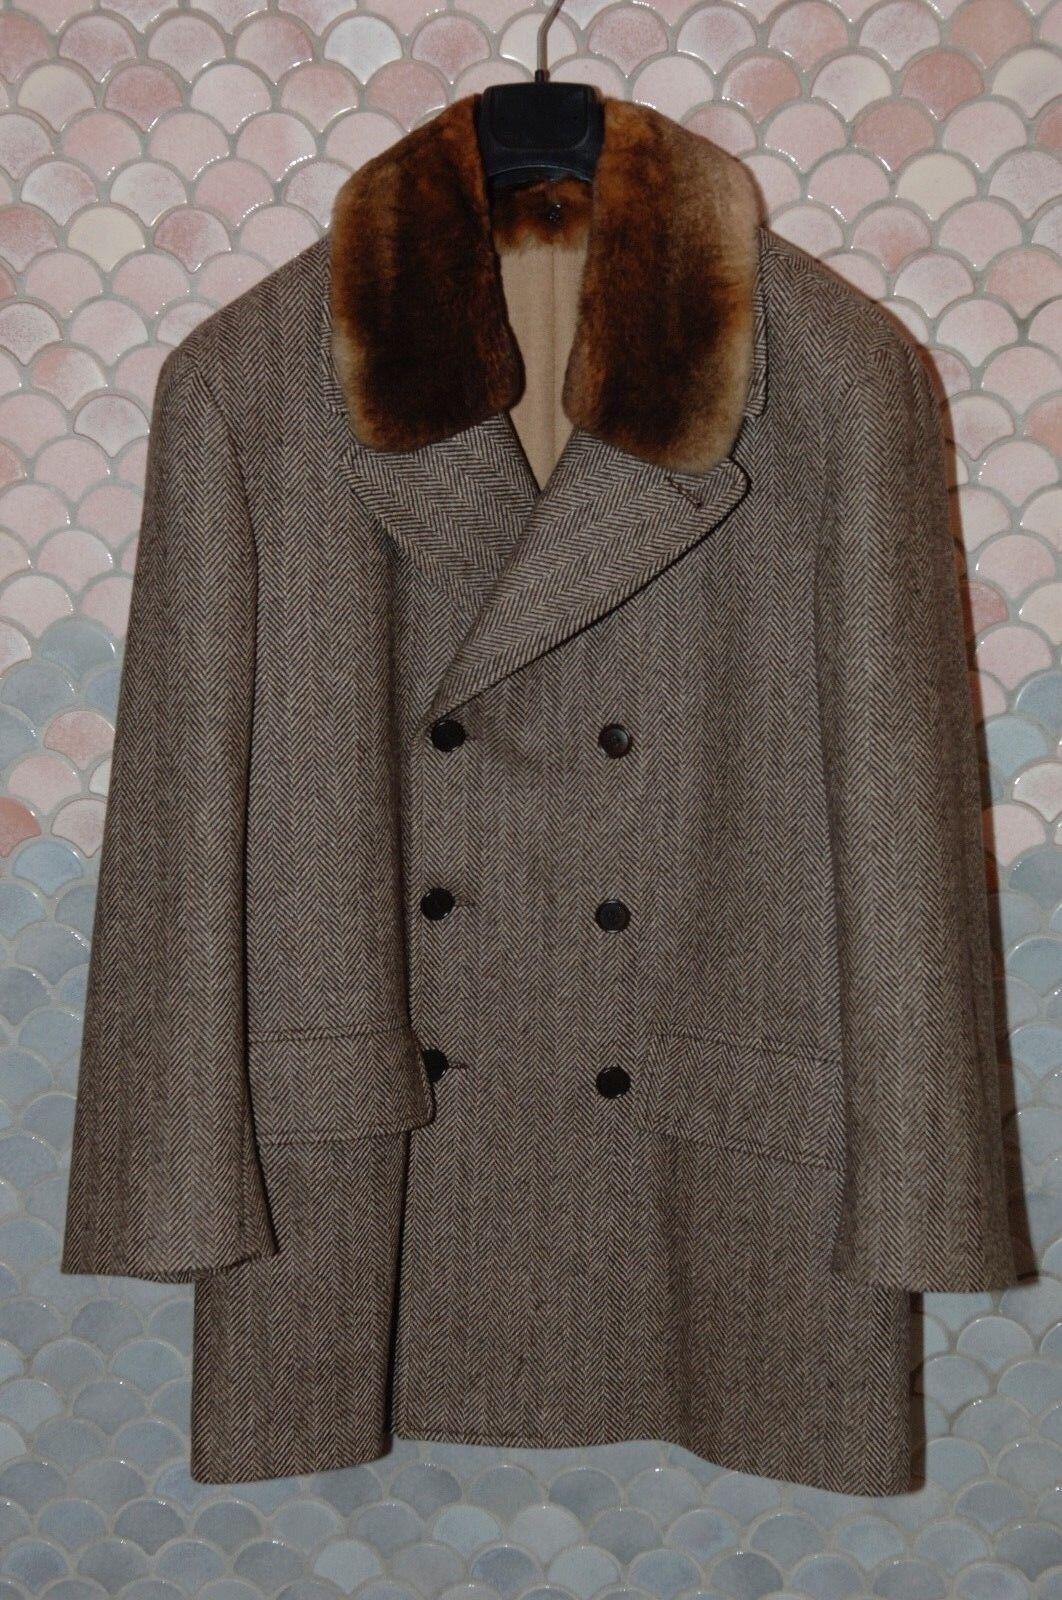 KITON Herringbone Short Coat, 100% Cashmere, EU 52/US 42R, Never worn, Mint